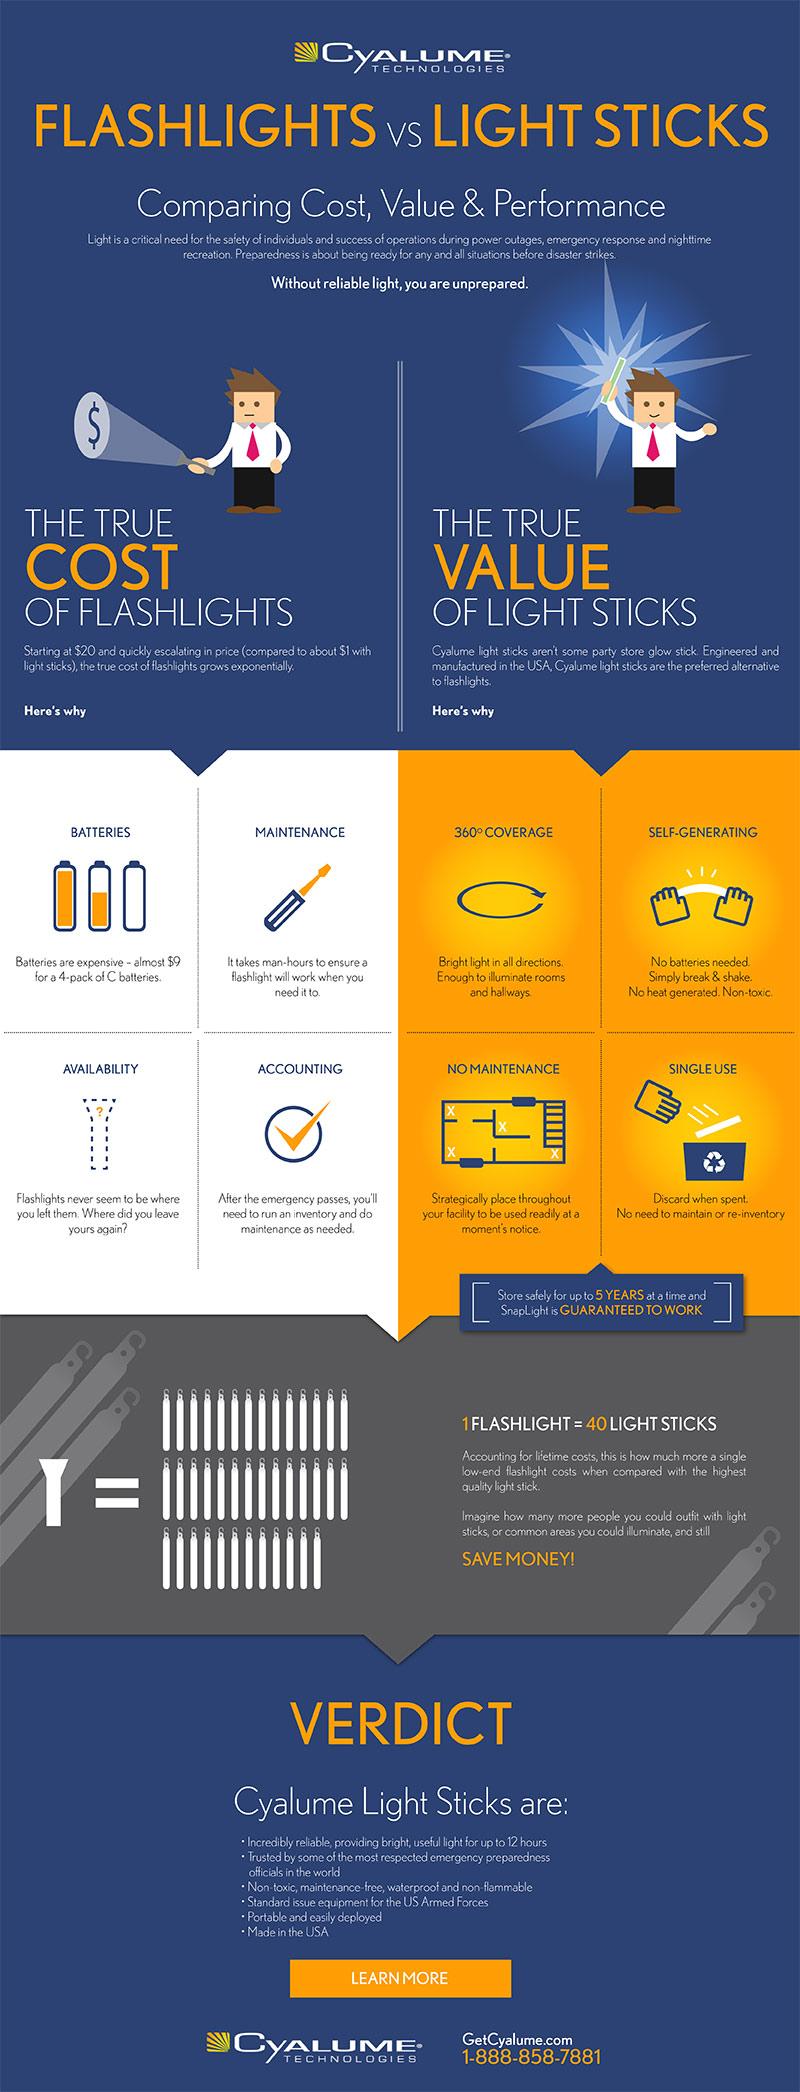 flashlight vs light stick infographic